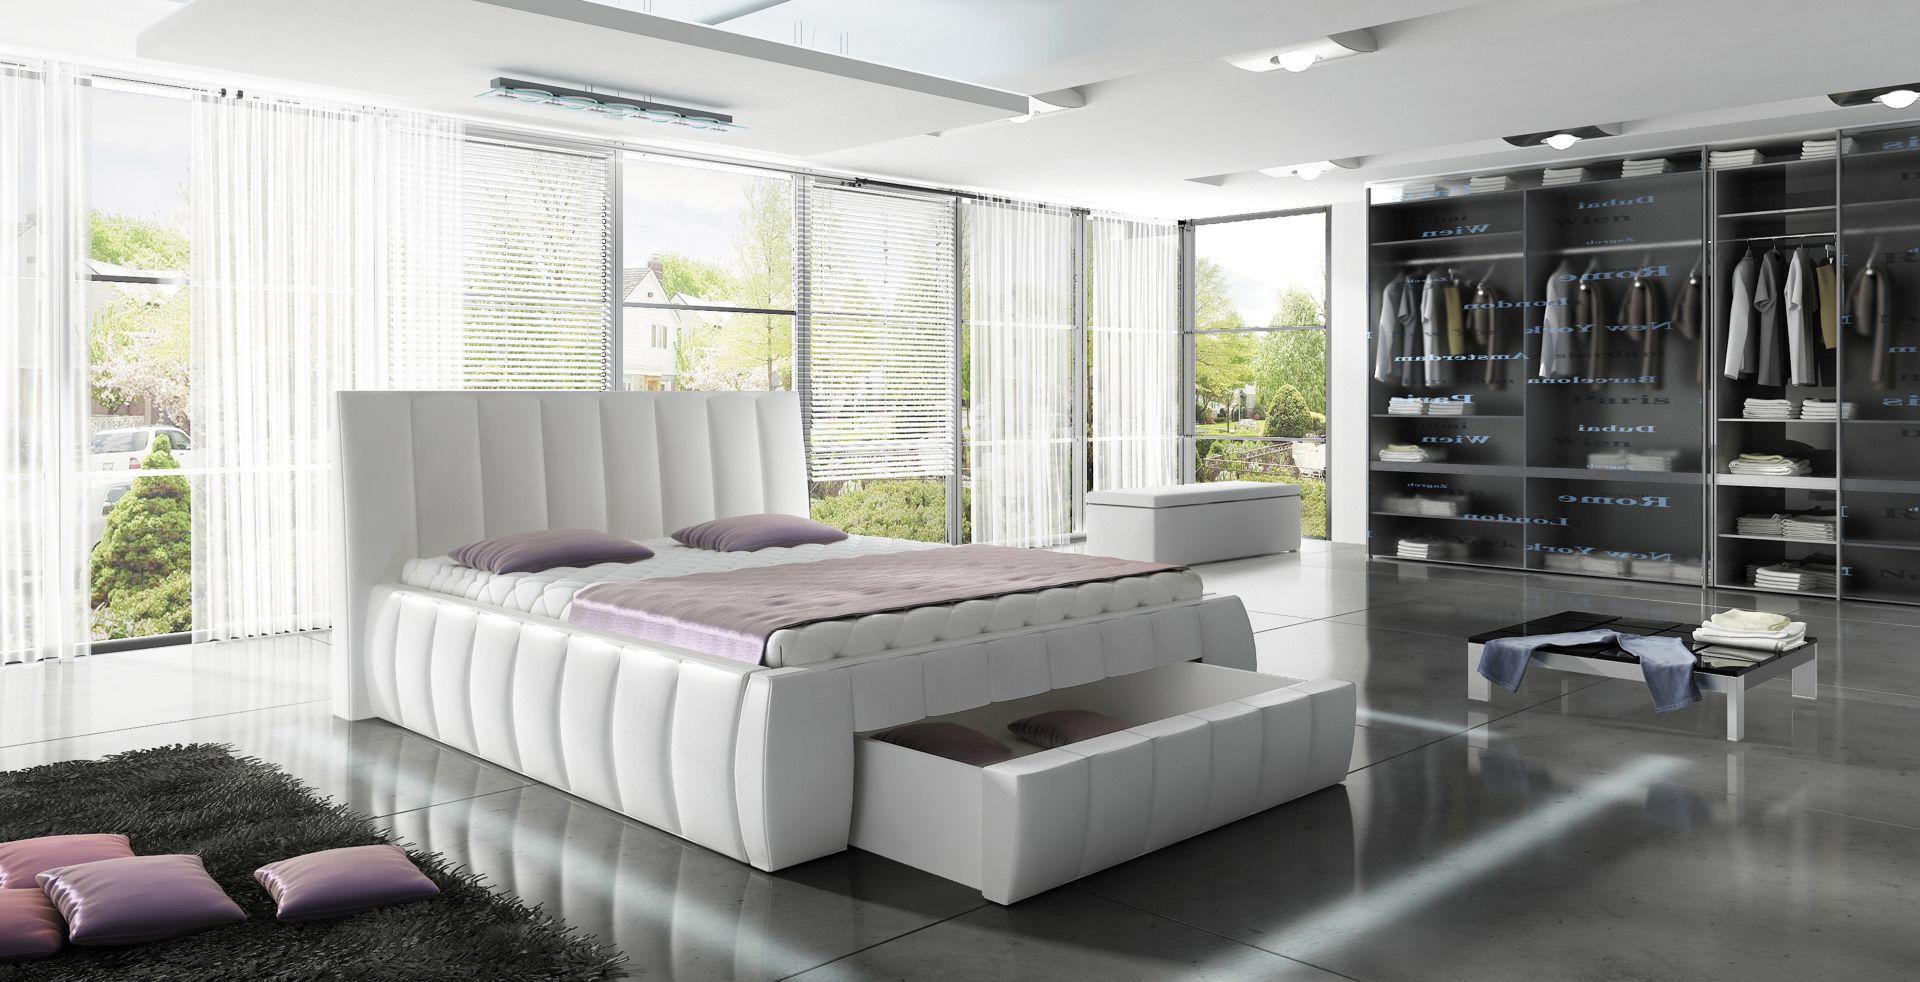 Wersal Manželská posteľ ROMA / 180 x 200